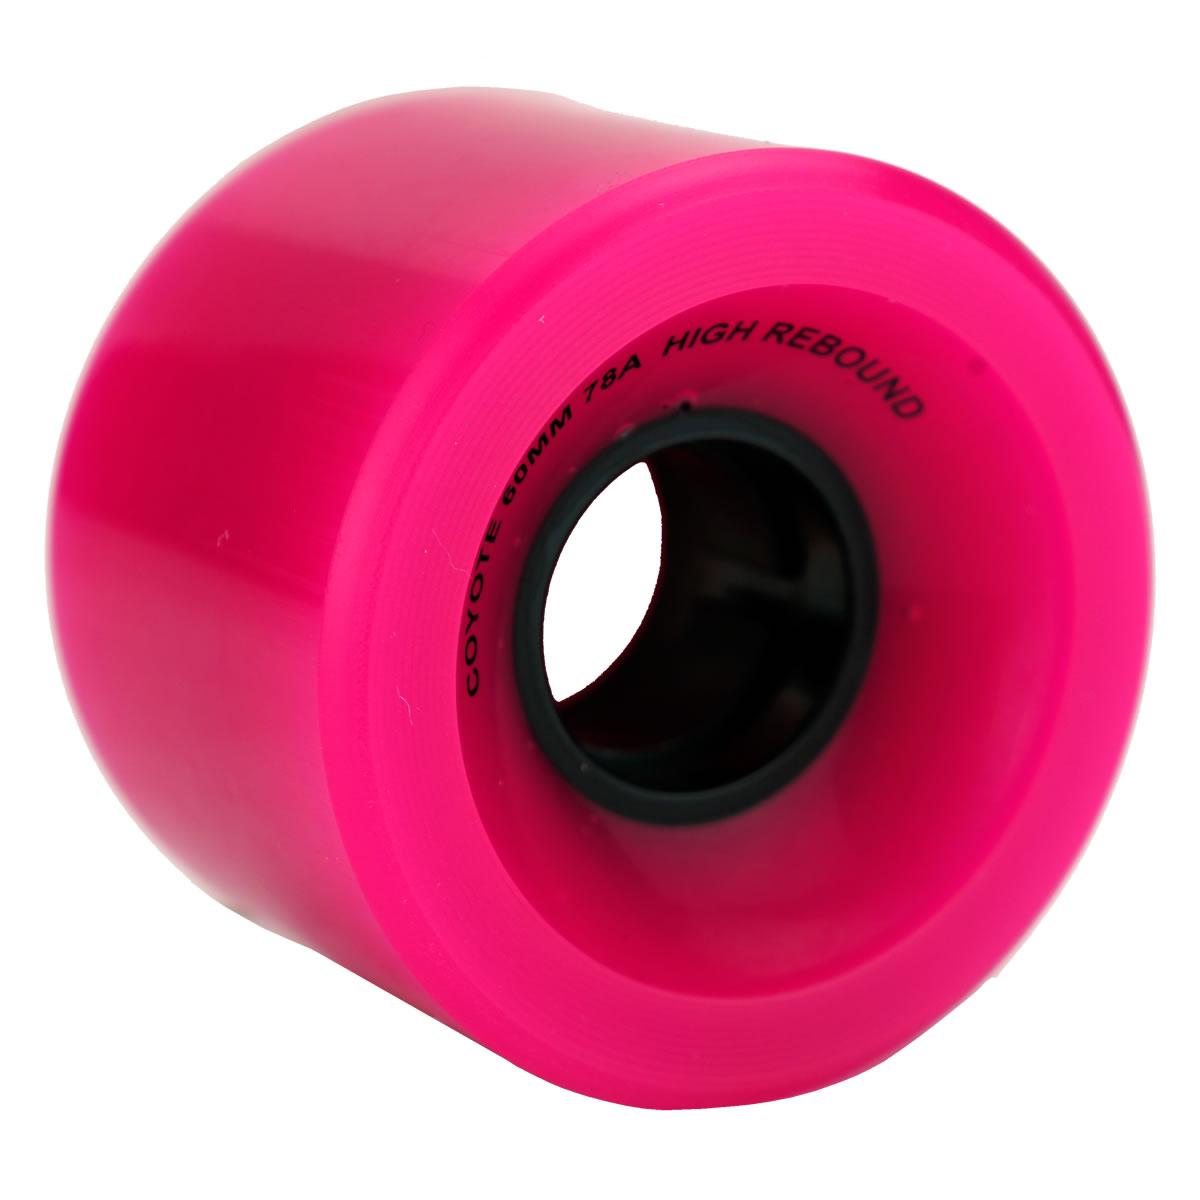 Coyote-Blank-60mm-Pink-Side-Angle.jpg